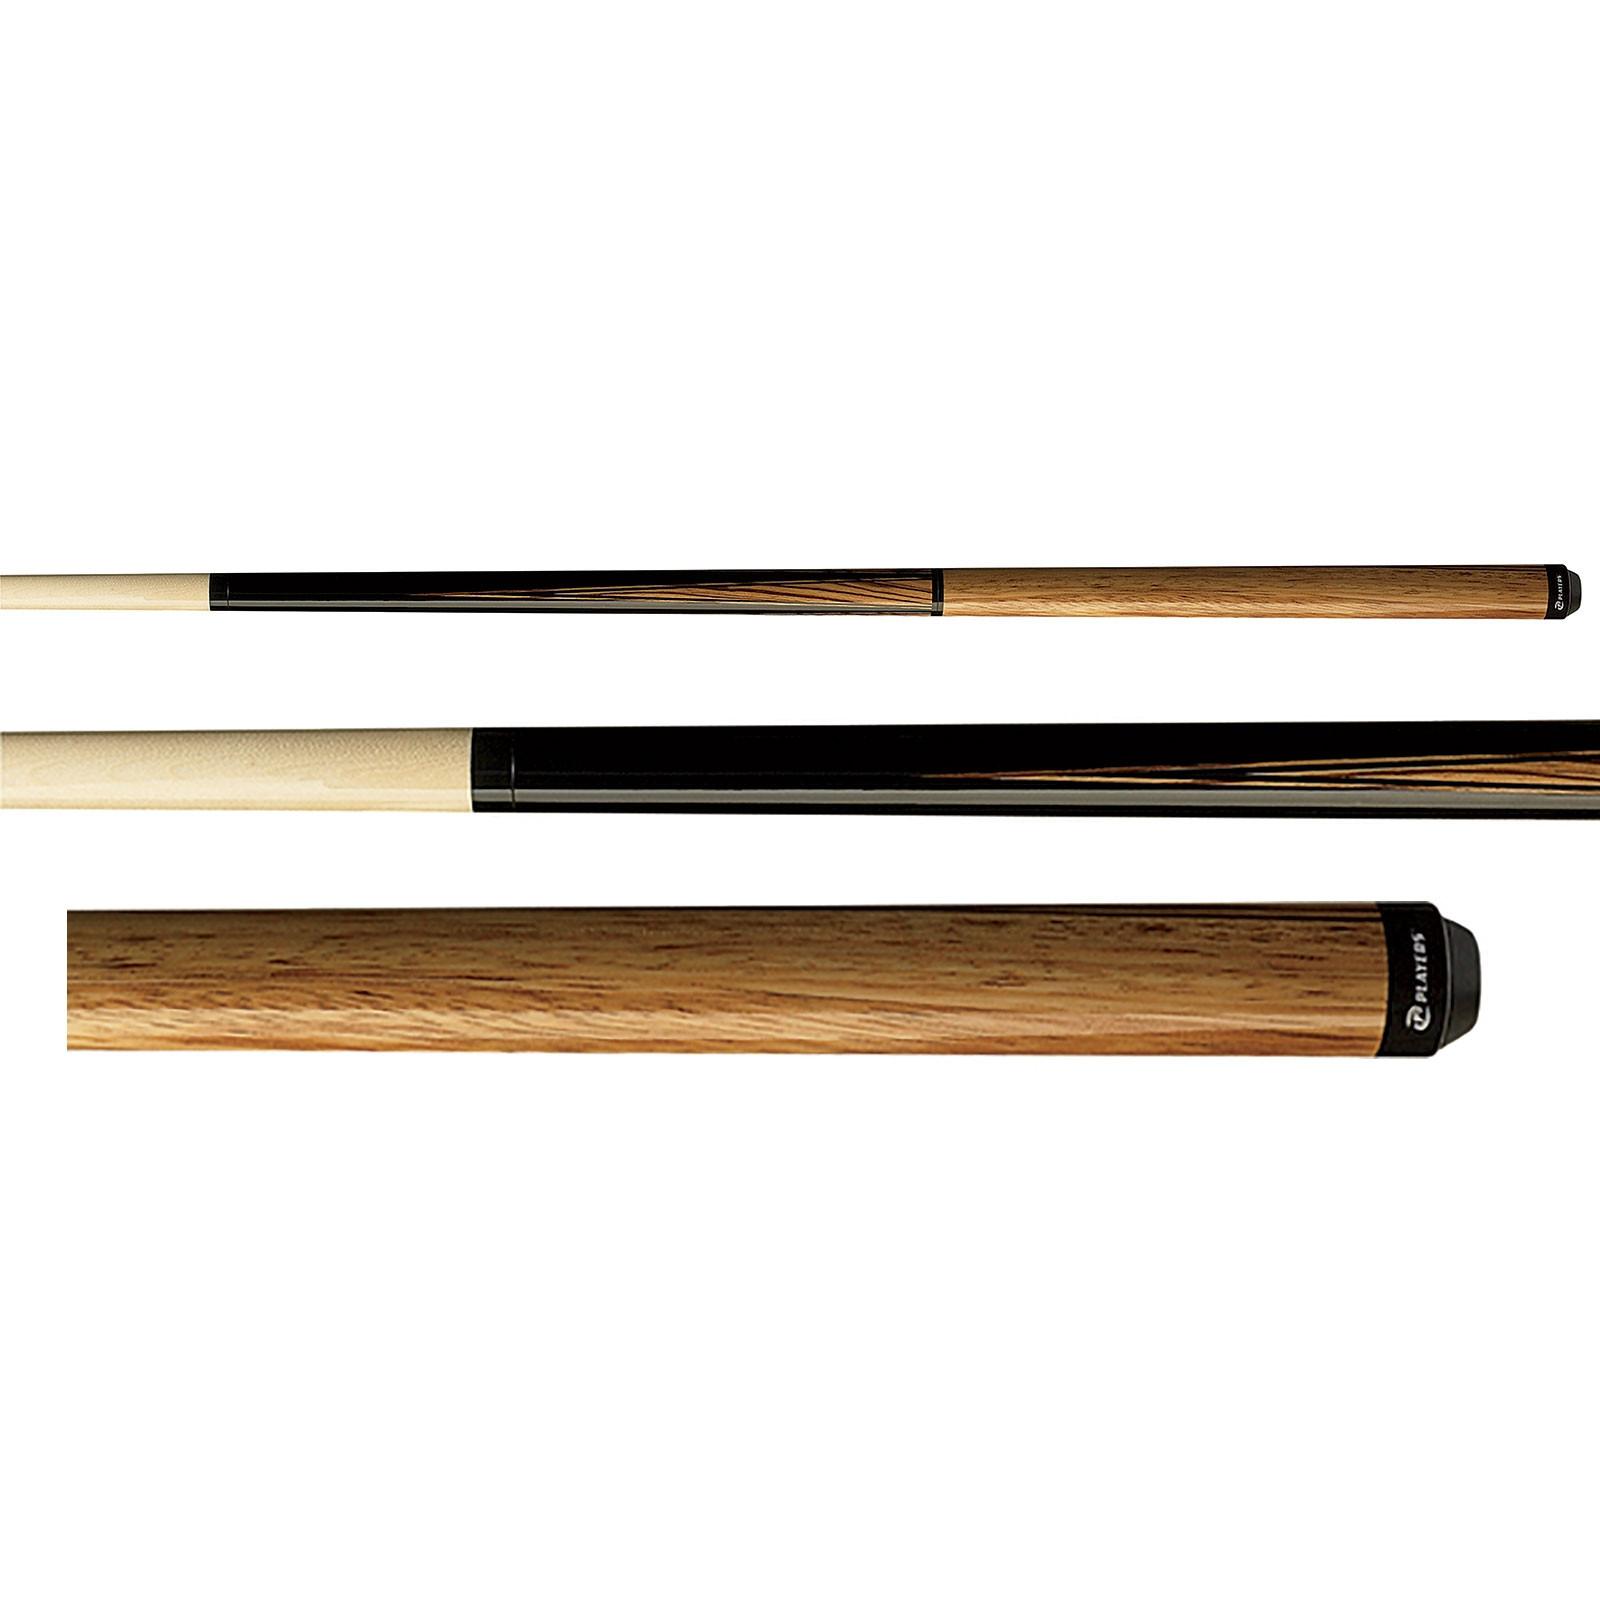 Players JB12 Maple and Zebrawood Jump Break Pool Cue Stick